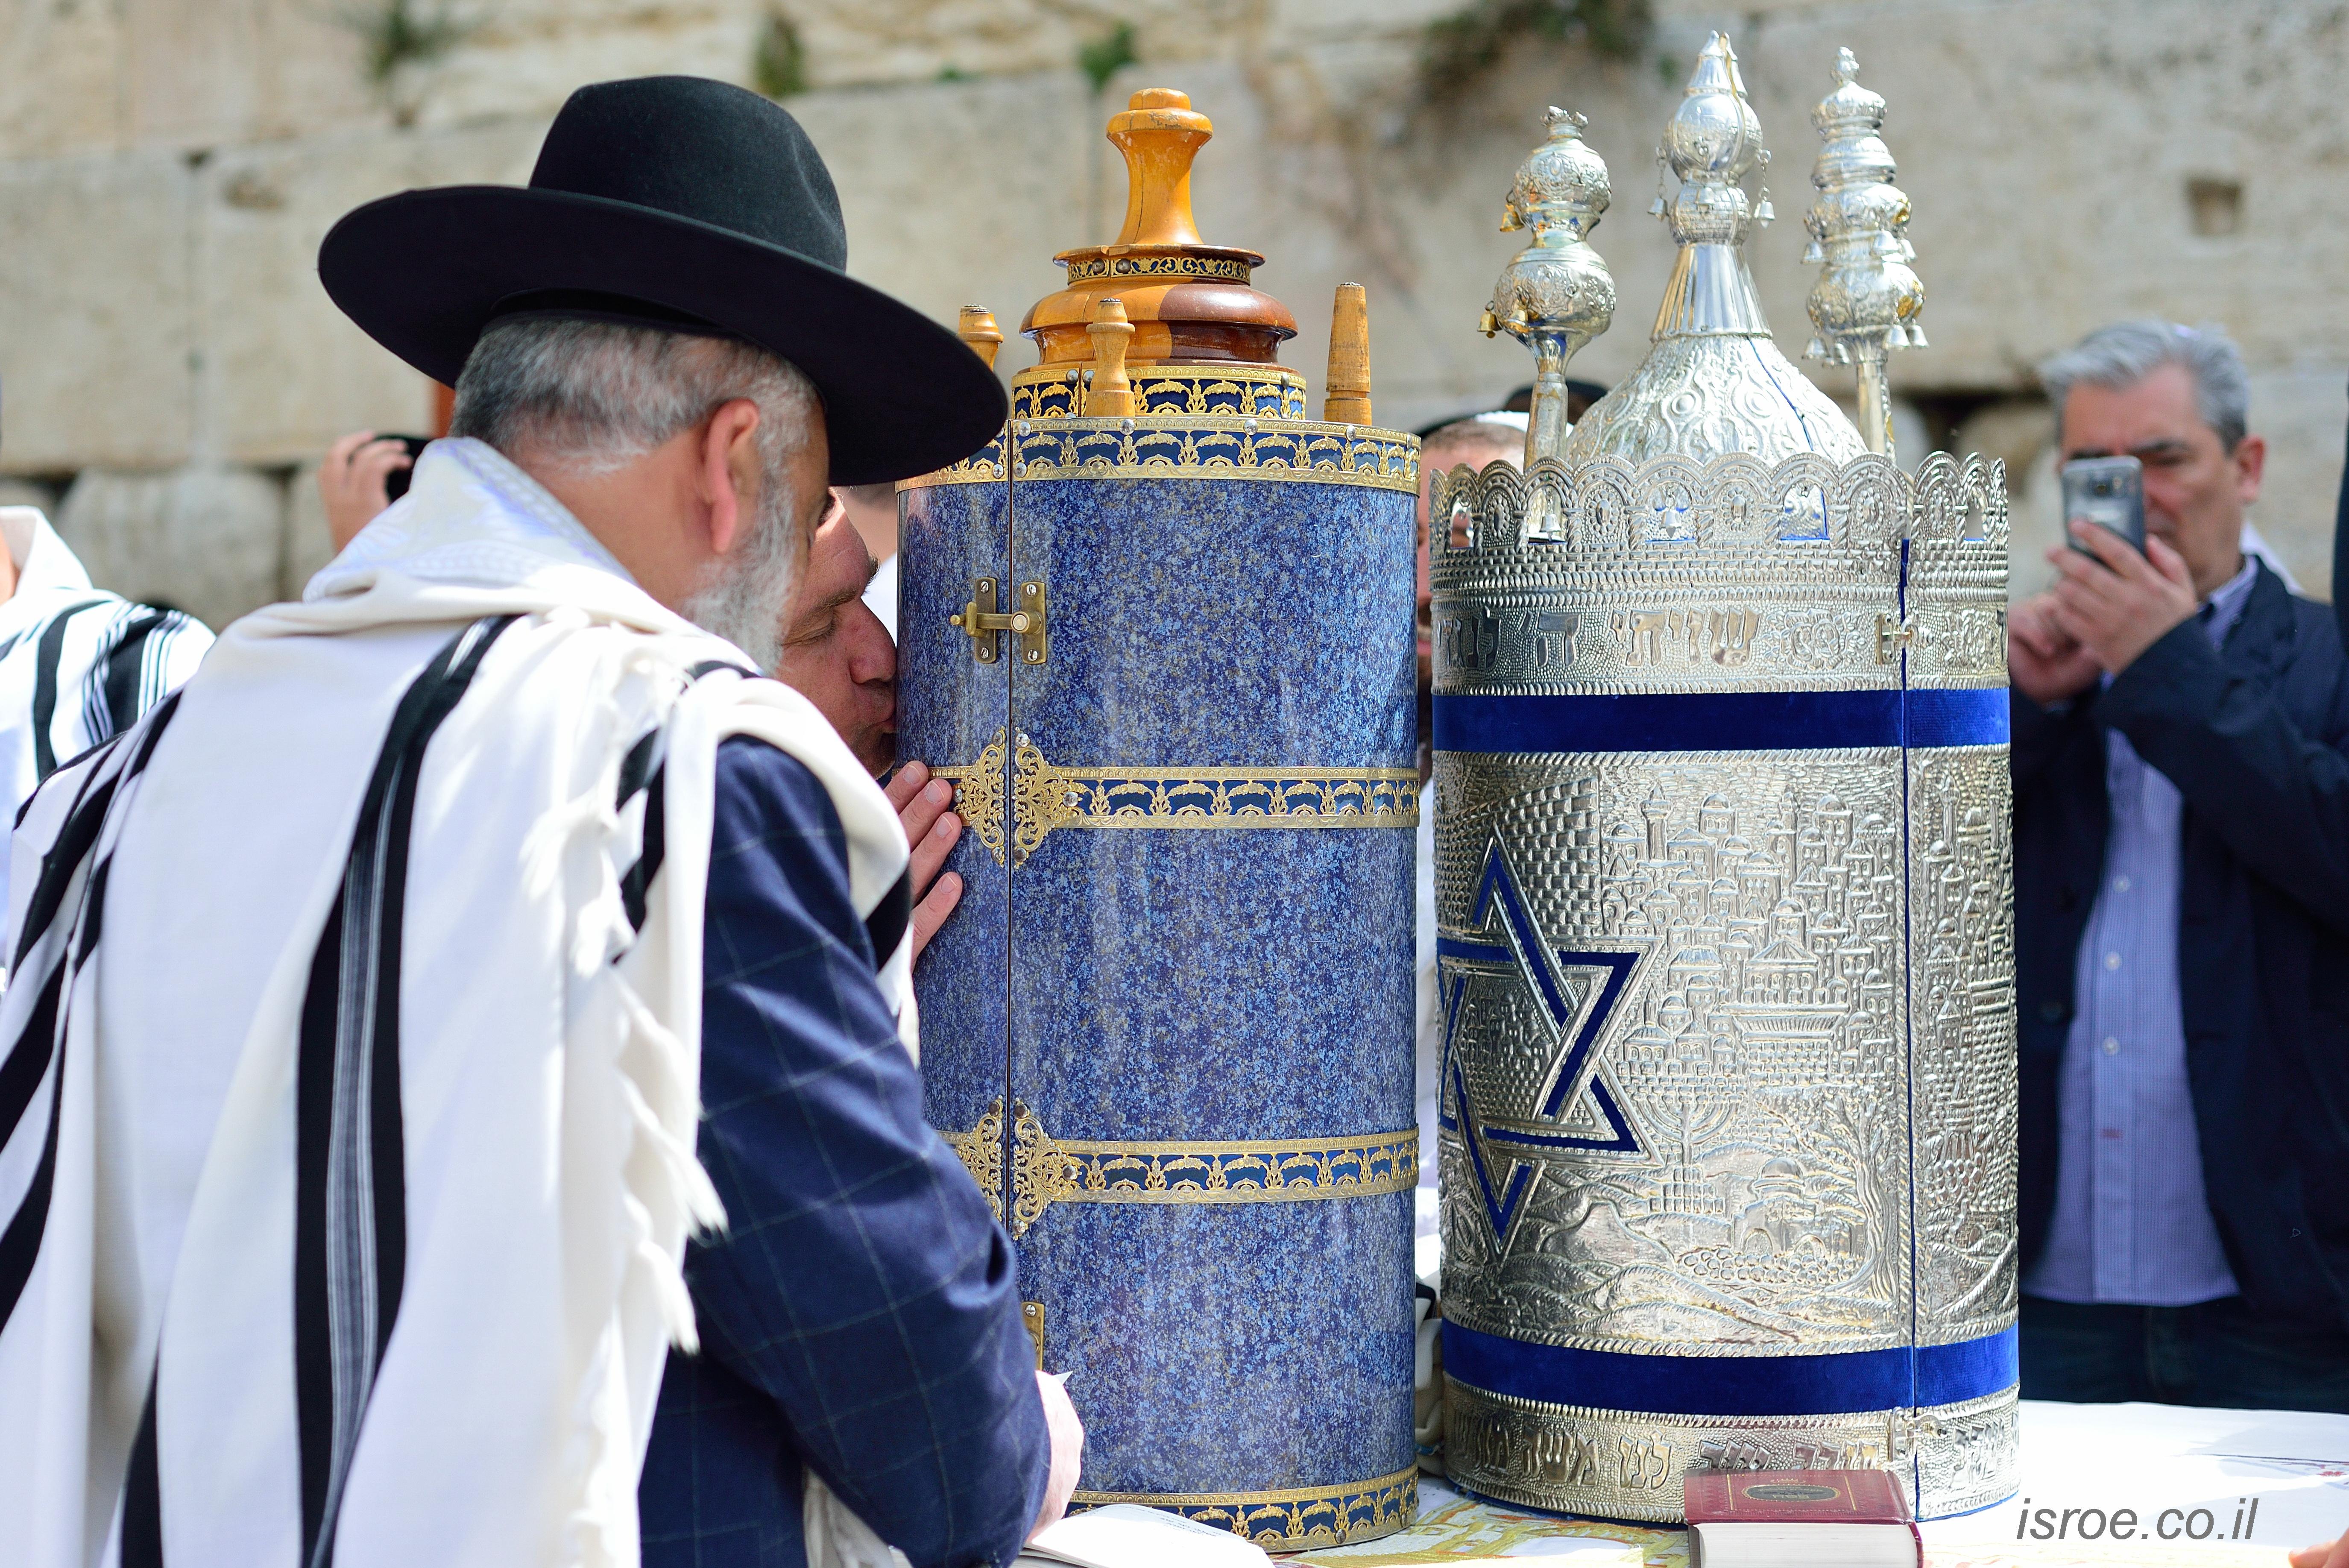 JERUSALEM ISRAEL isroe.co.il